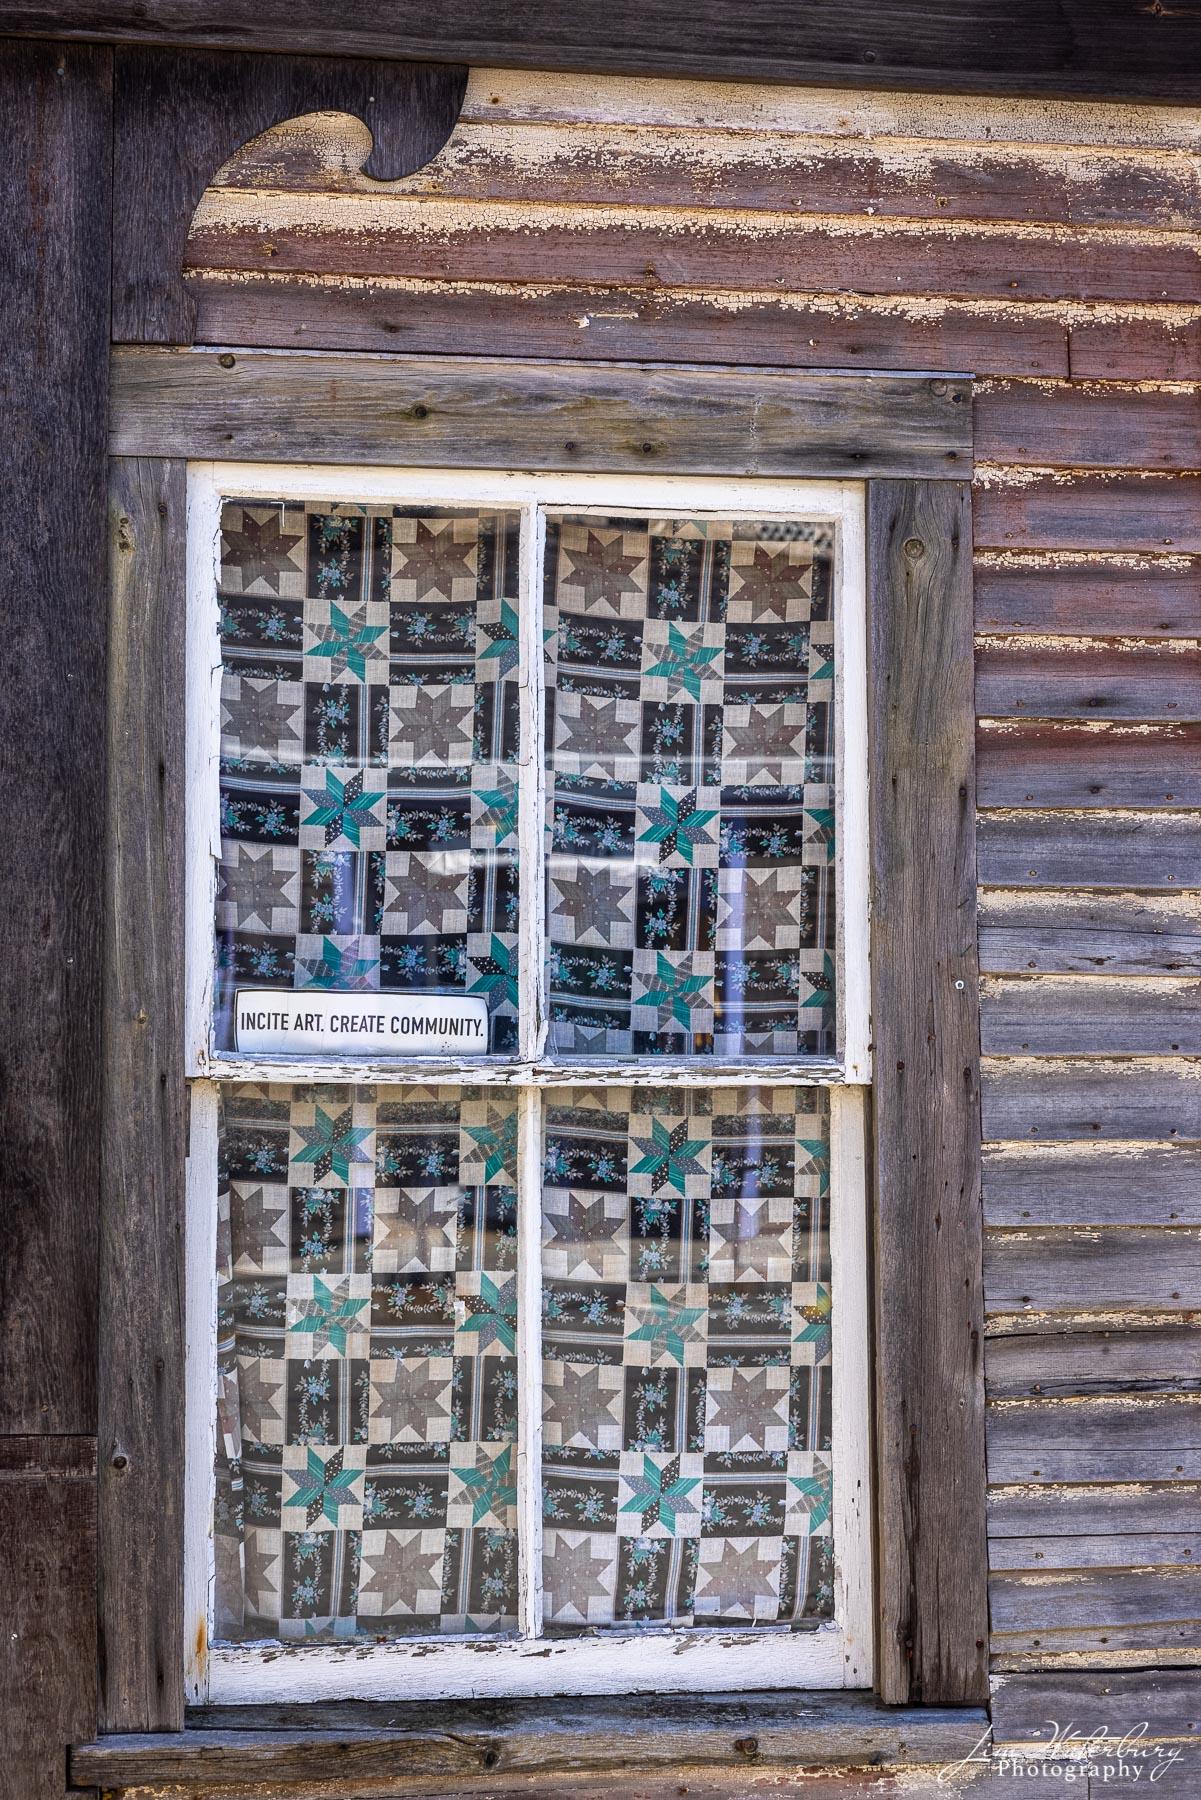 Window display in a Maine seaside village.